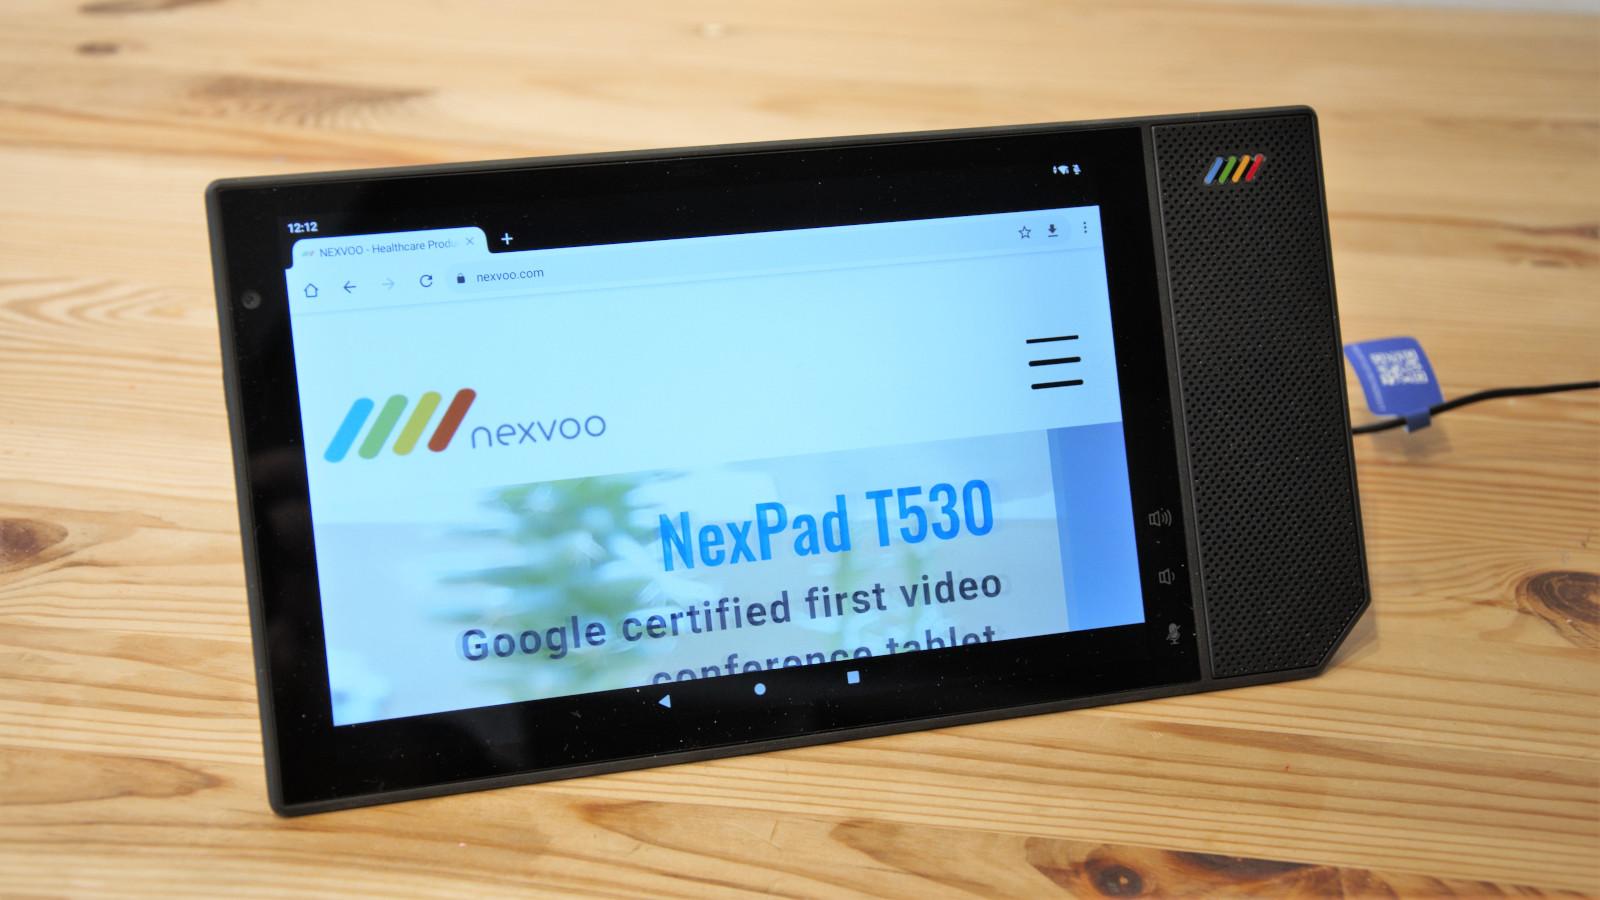 Nexvoo NexPad Pro T530